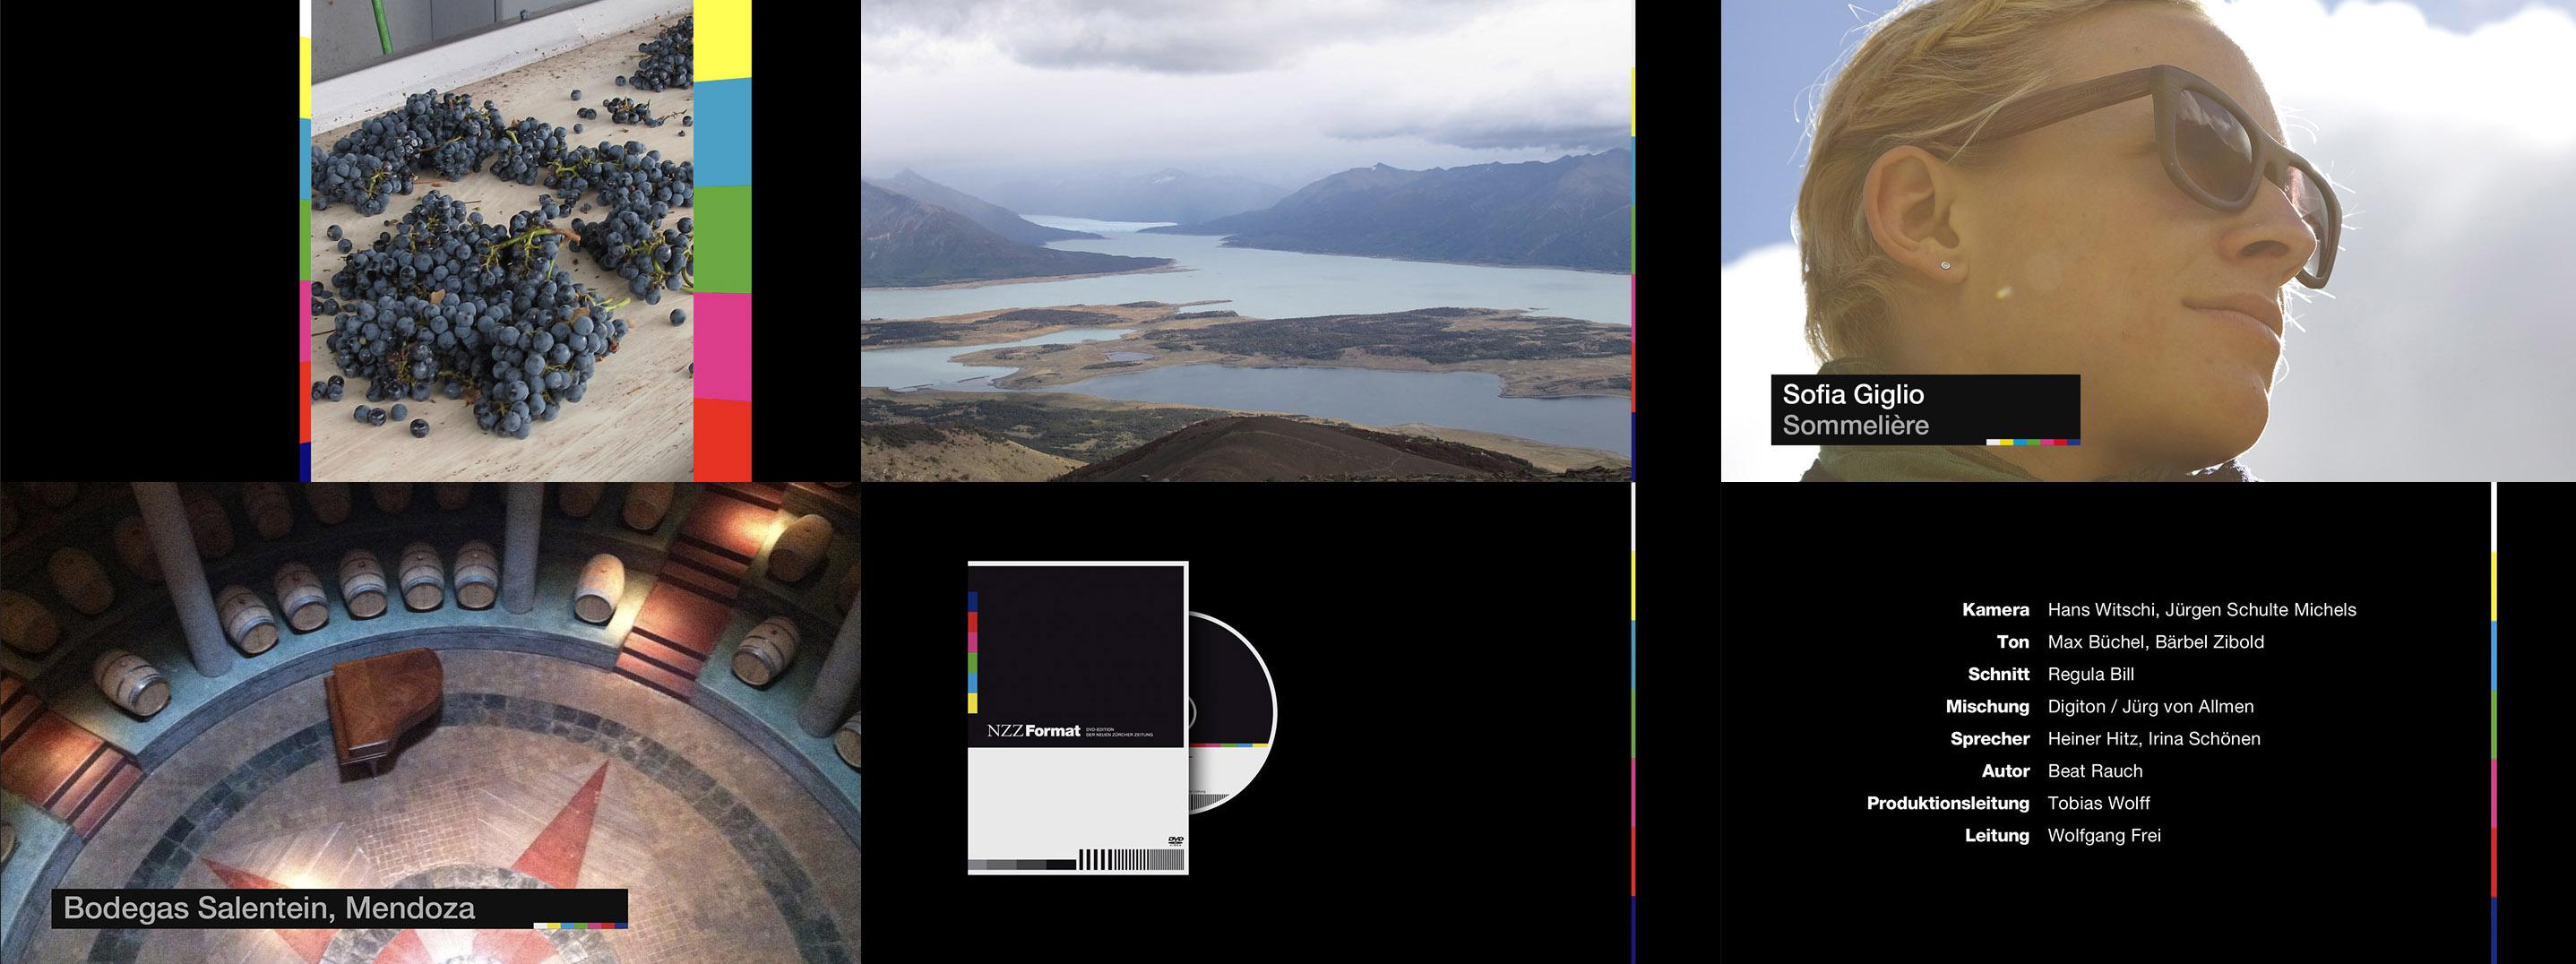 NZZ Format, NZZ Swiss Made, Wipes, Lower Thirds, Overview, Graphics, Motion Design, Motion Graphics, Michael Frei, Zurich, Switzerland.